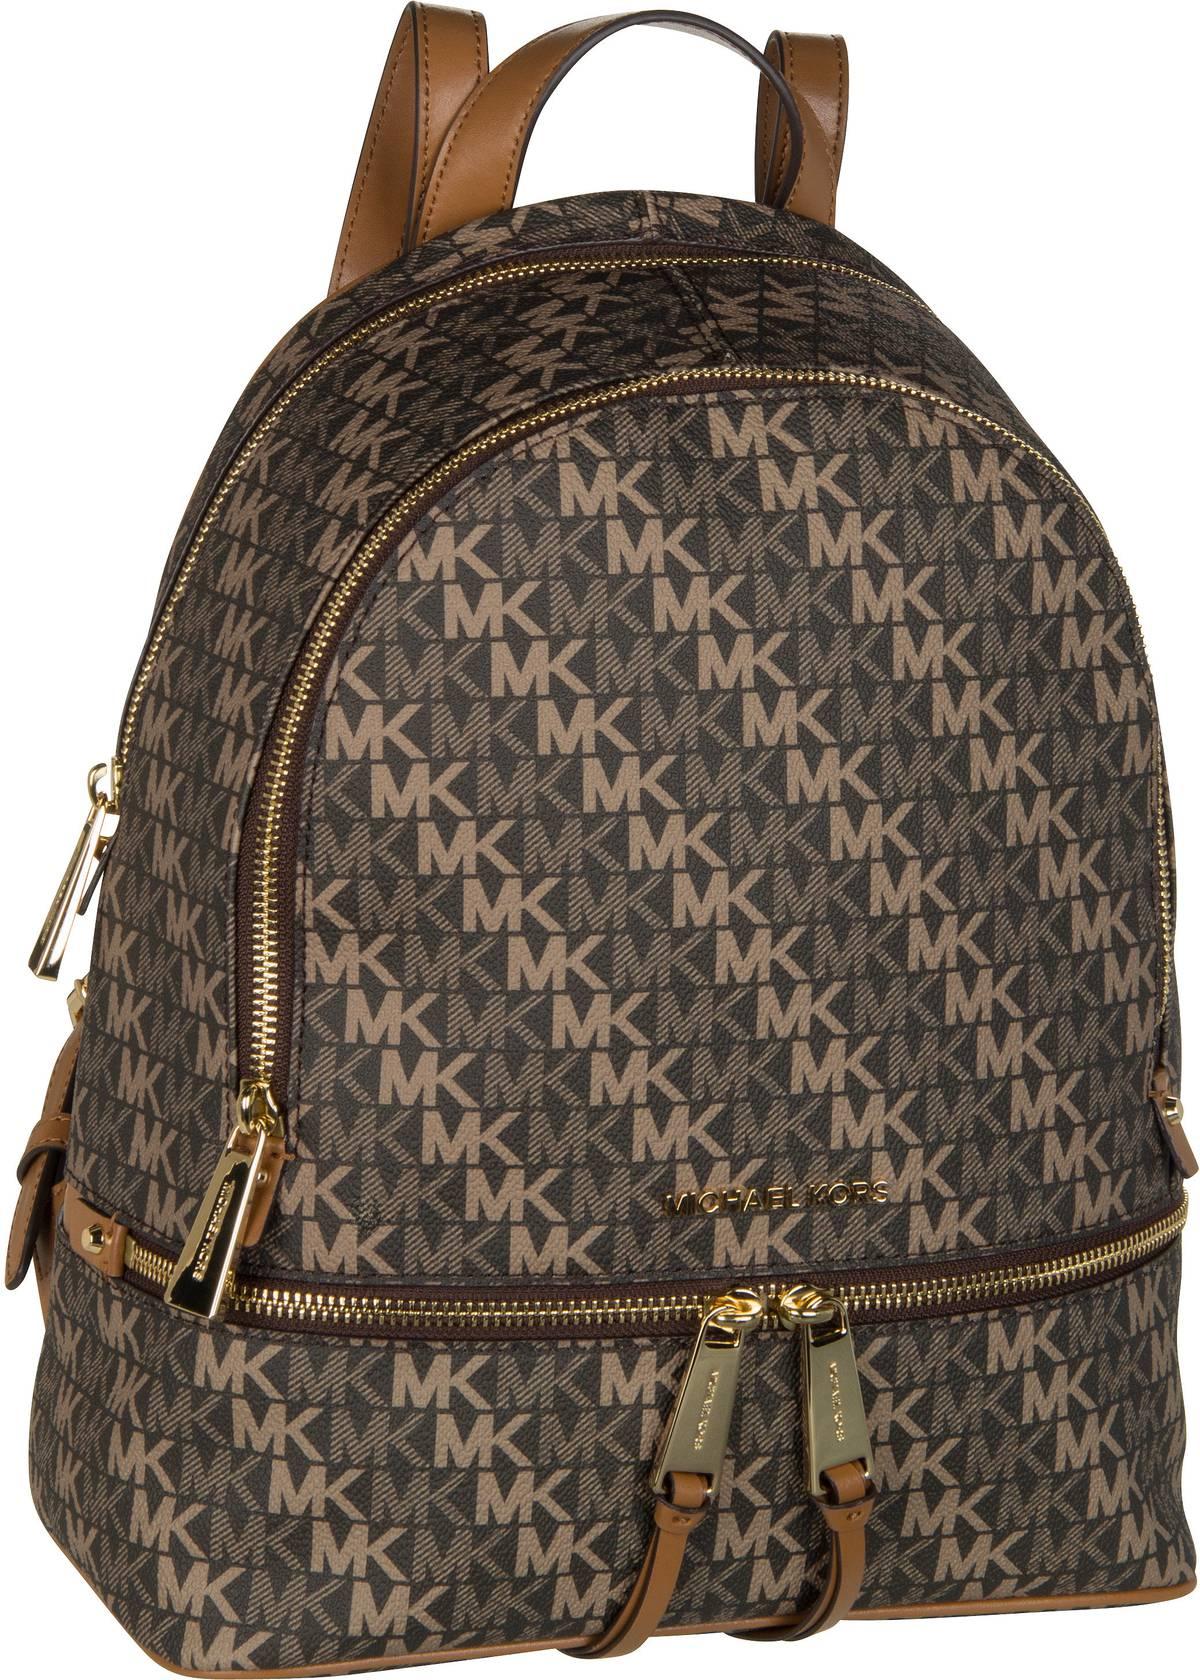 Rucksack / Daypack Rhea Zip Medium Backpack Bicolor Brown/Acorn